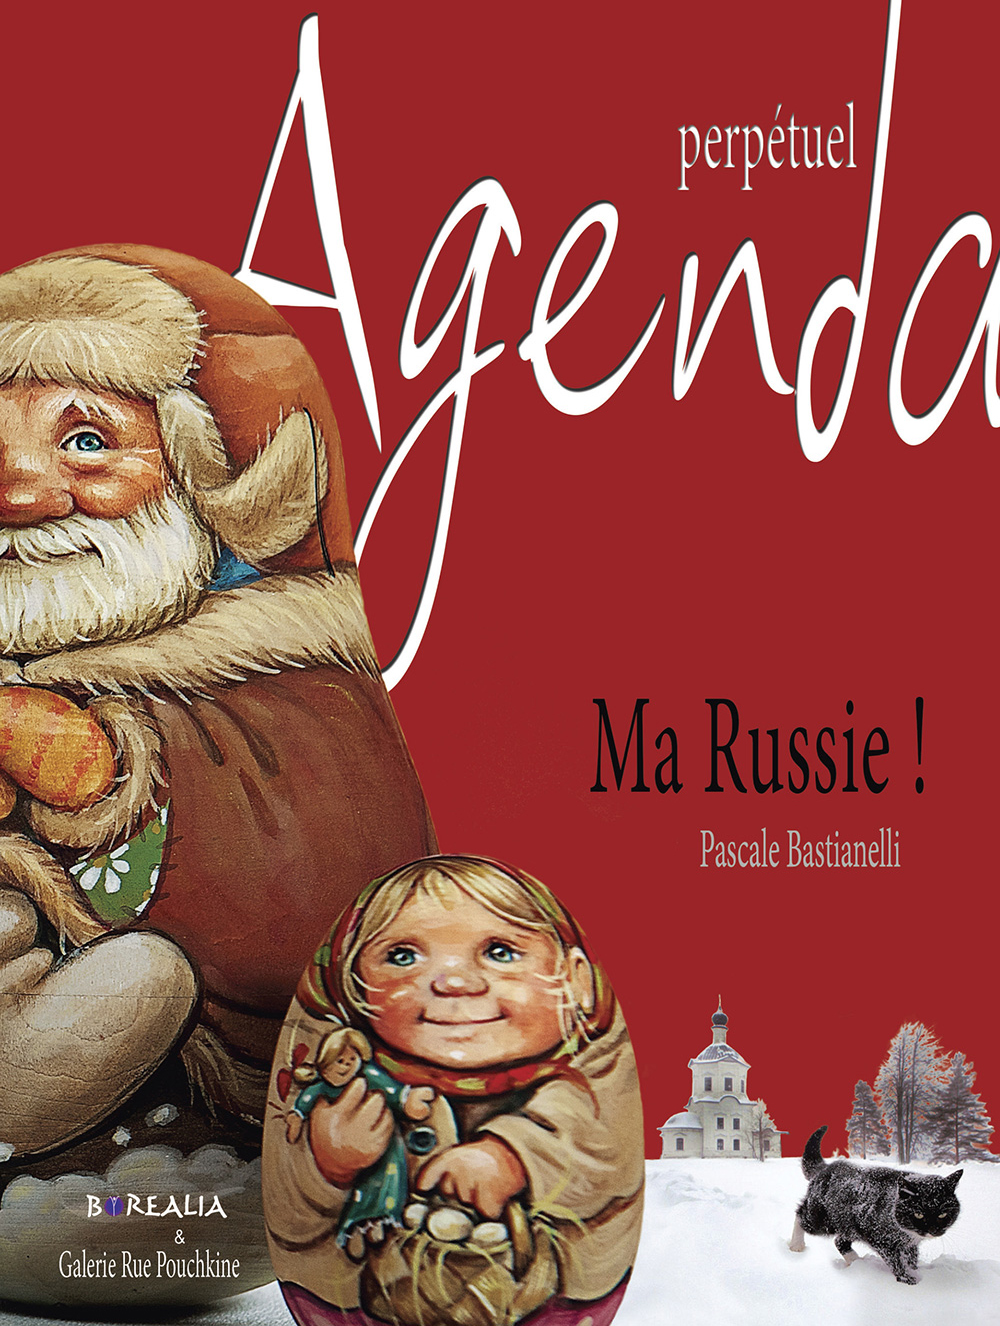 Agenda Ma Russie